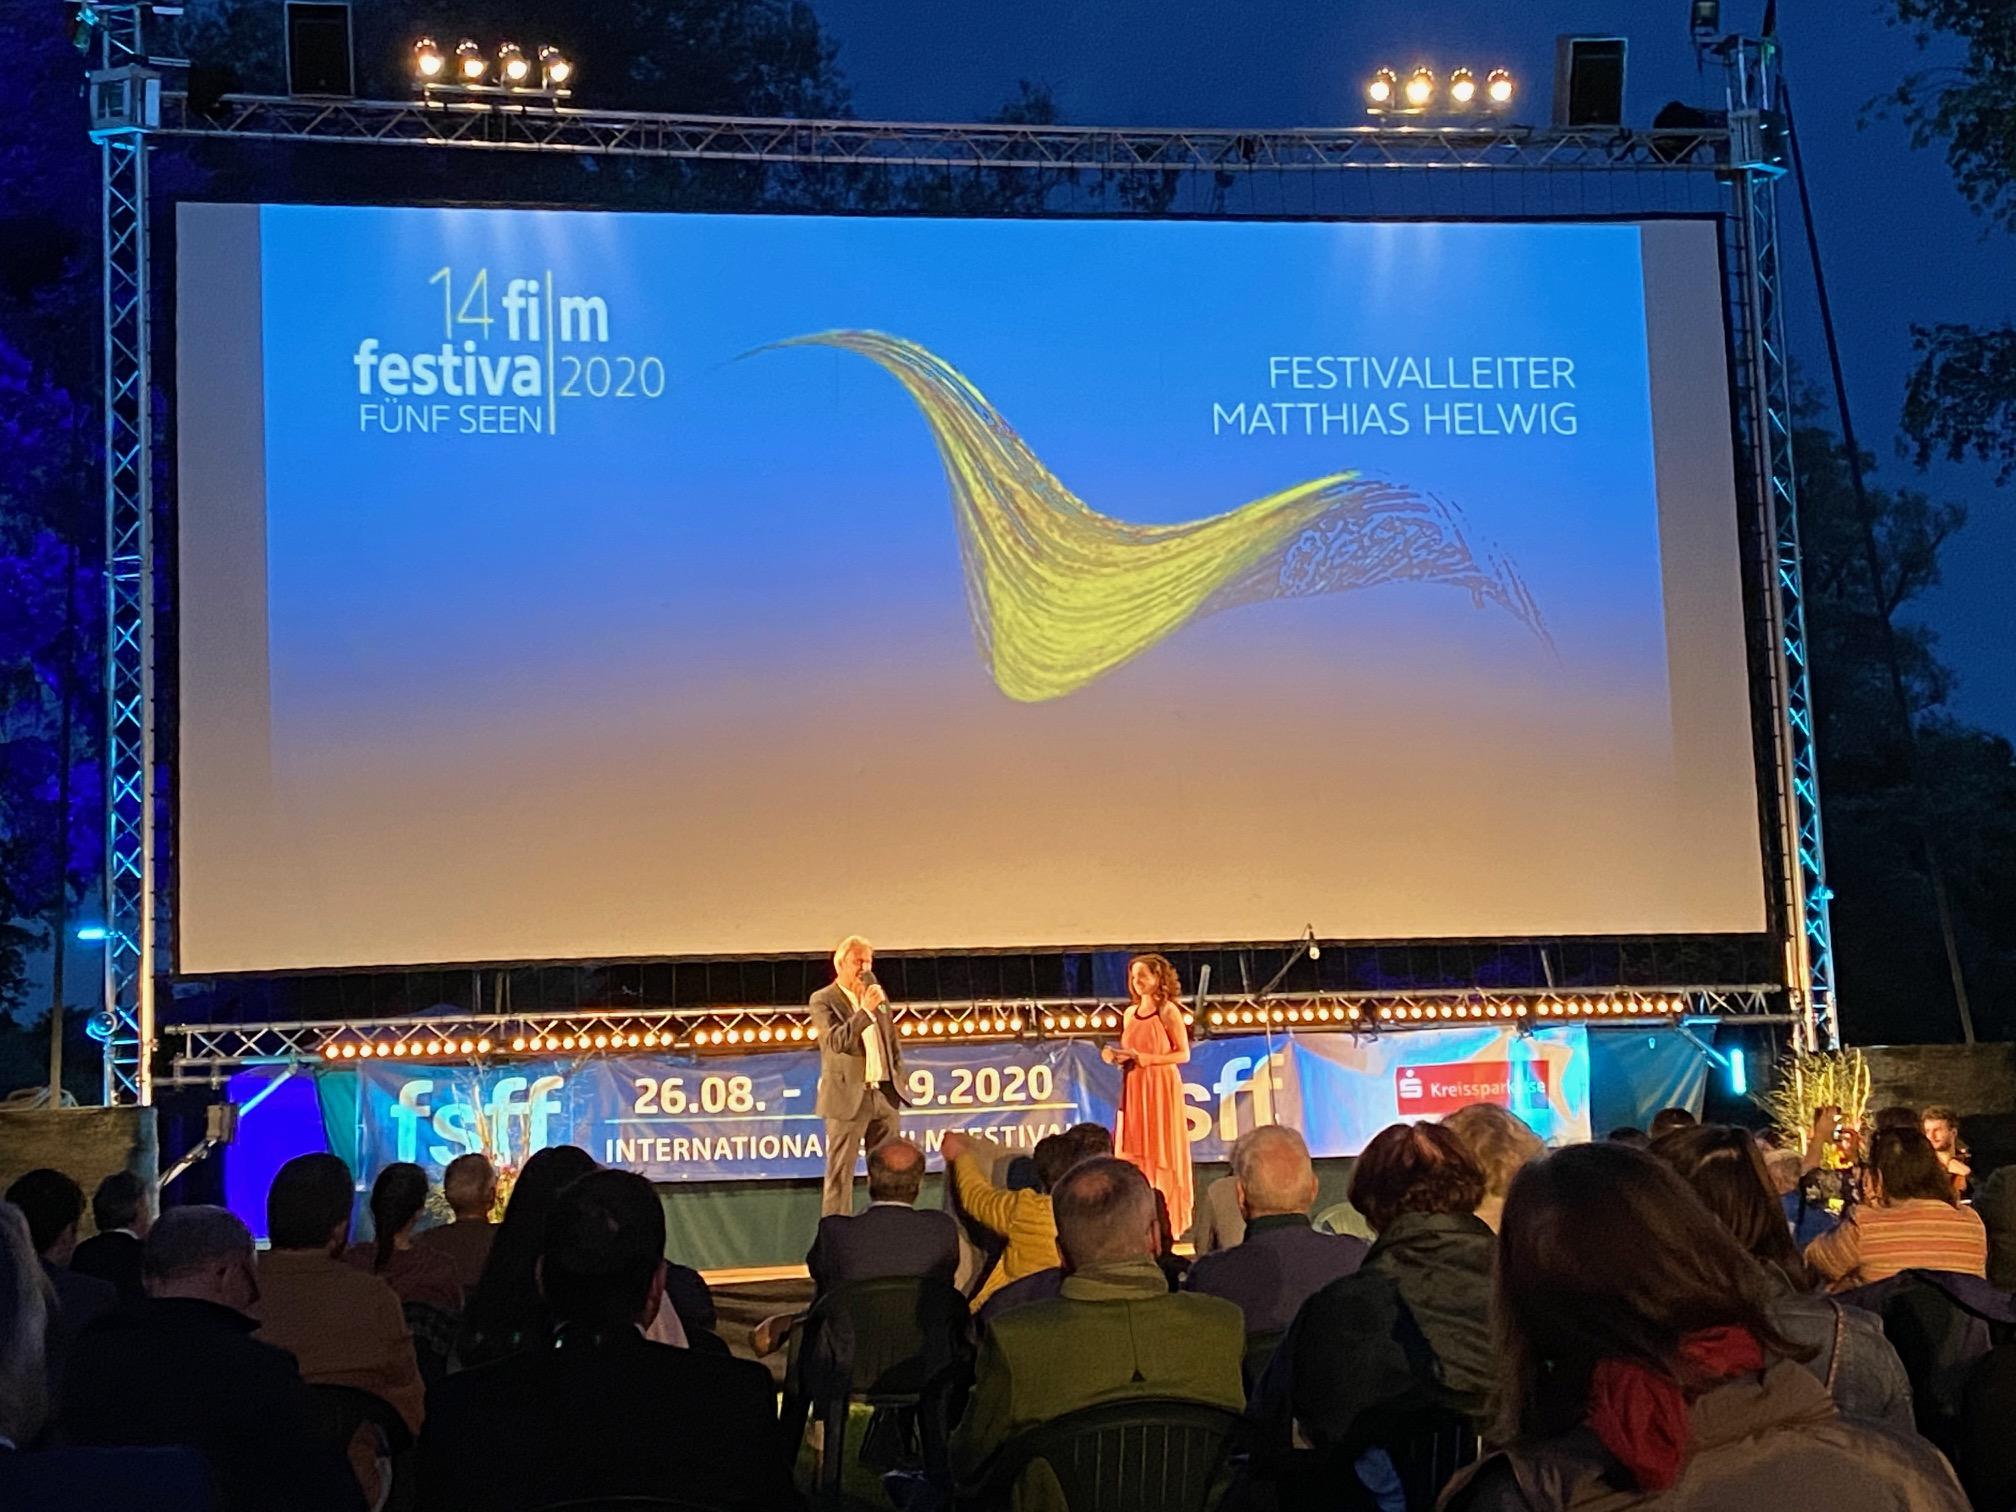 Fünf Seen-Filmfestival 2021